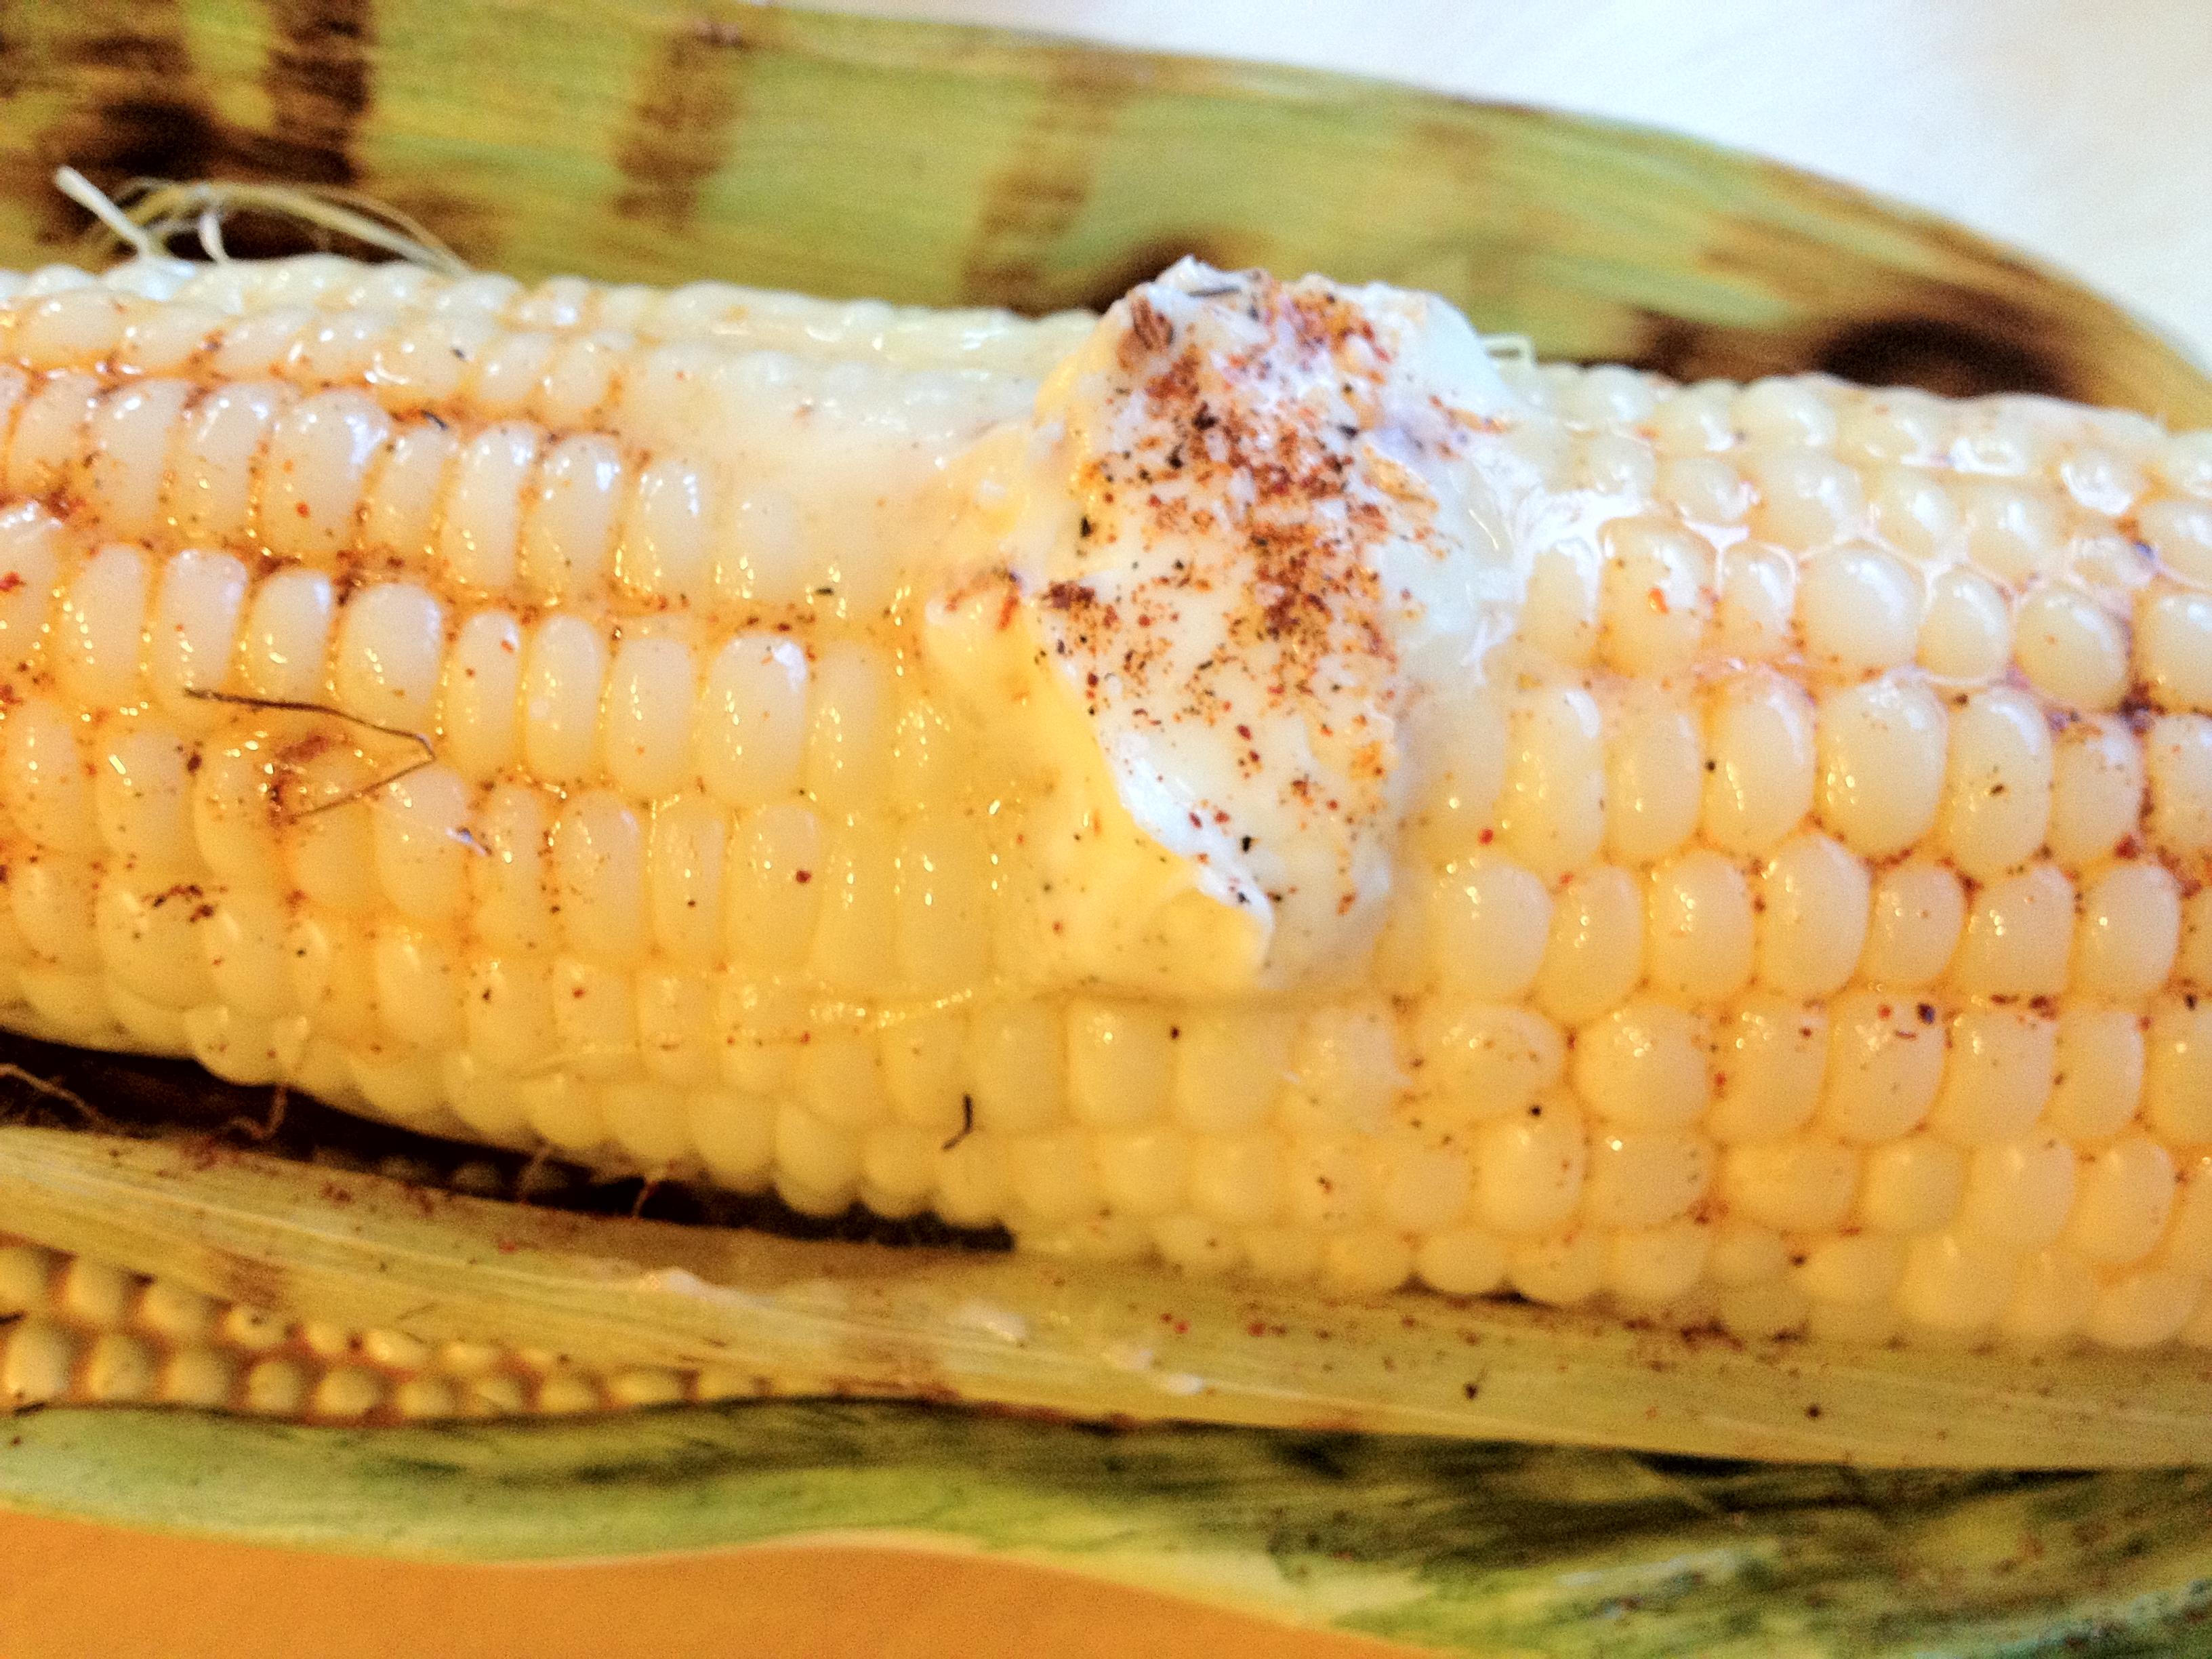 cornbarphoto Gridiron Grub: Get The Party Poppin With Corn